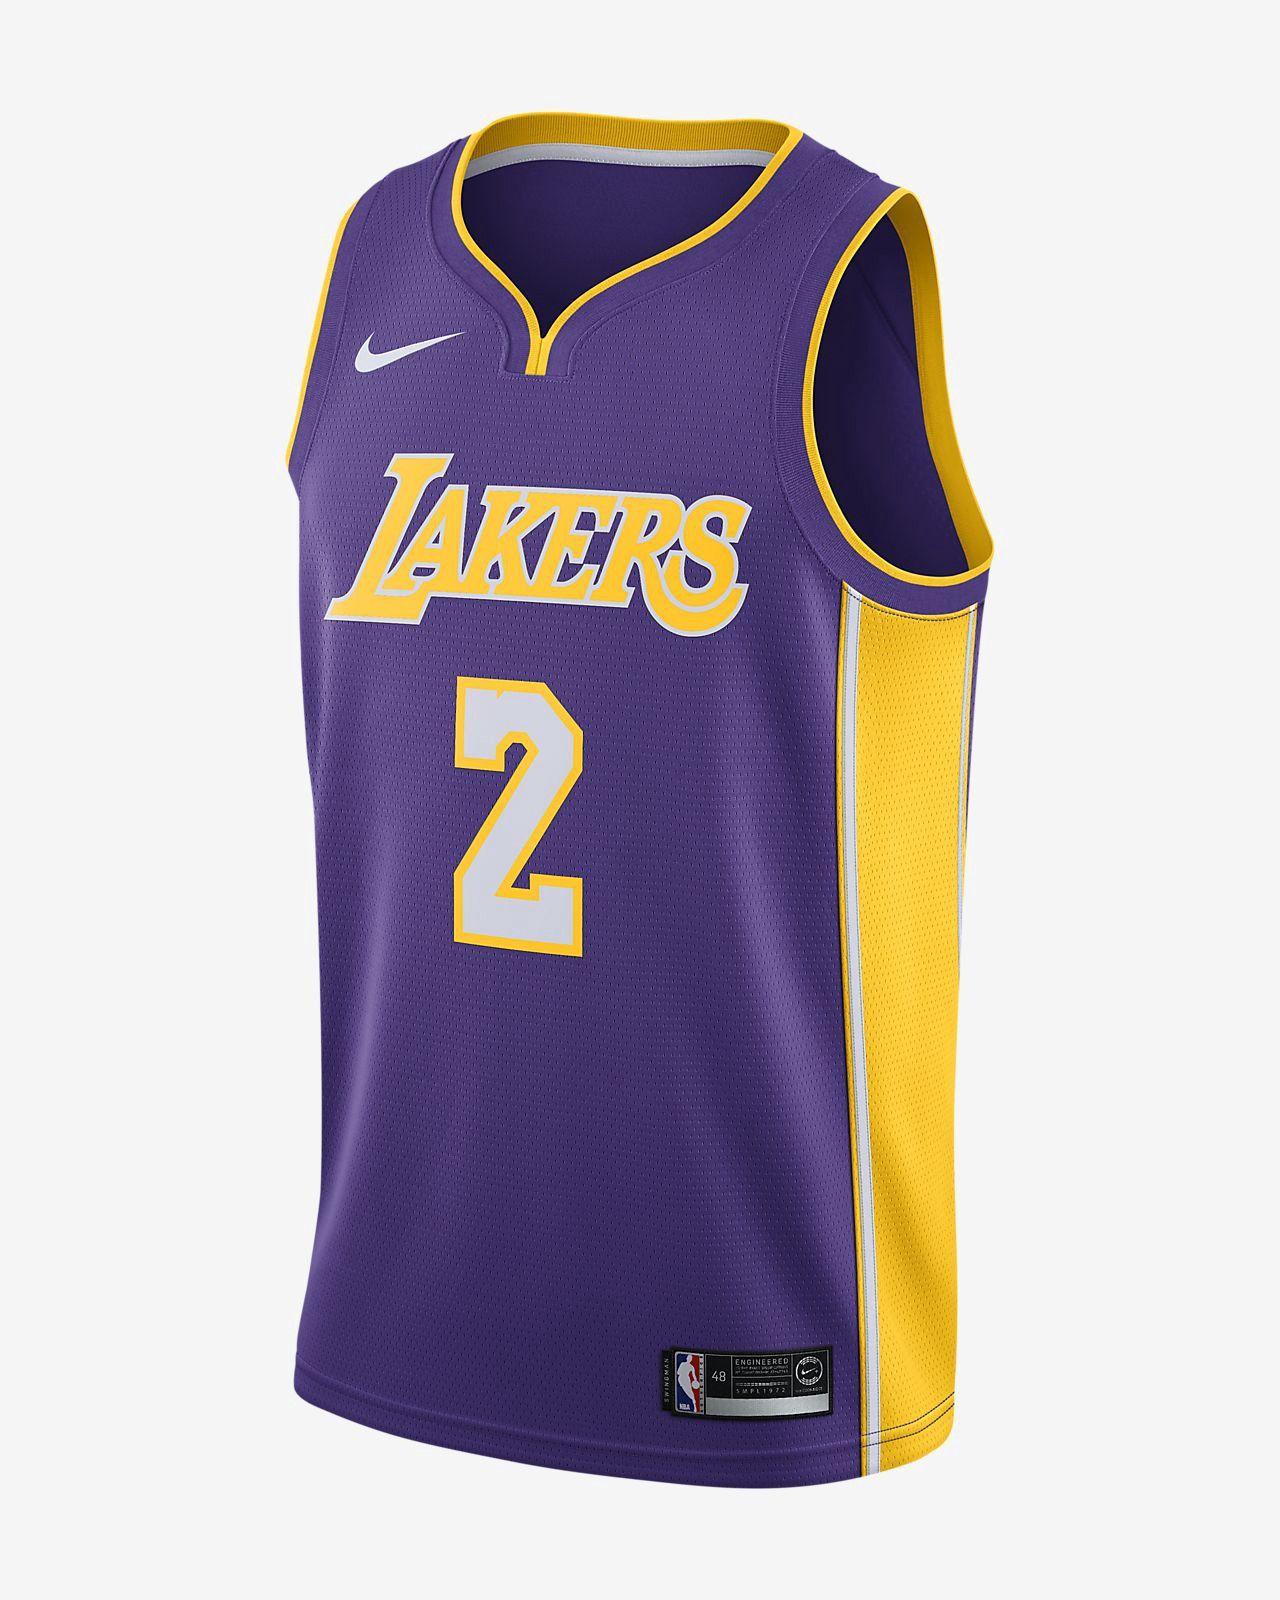 hot sale online 767a2 a8829 Nike Lonzo Ball Icon Edition Swingman Jersey (Los Angeles ...